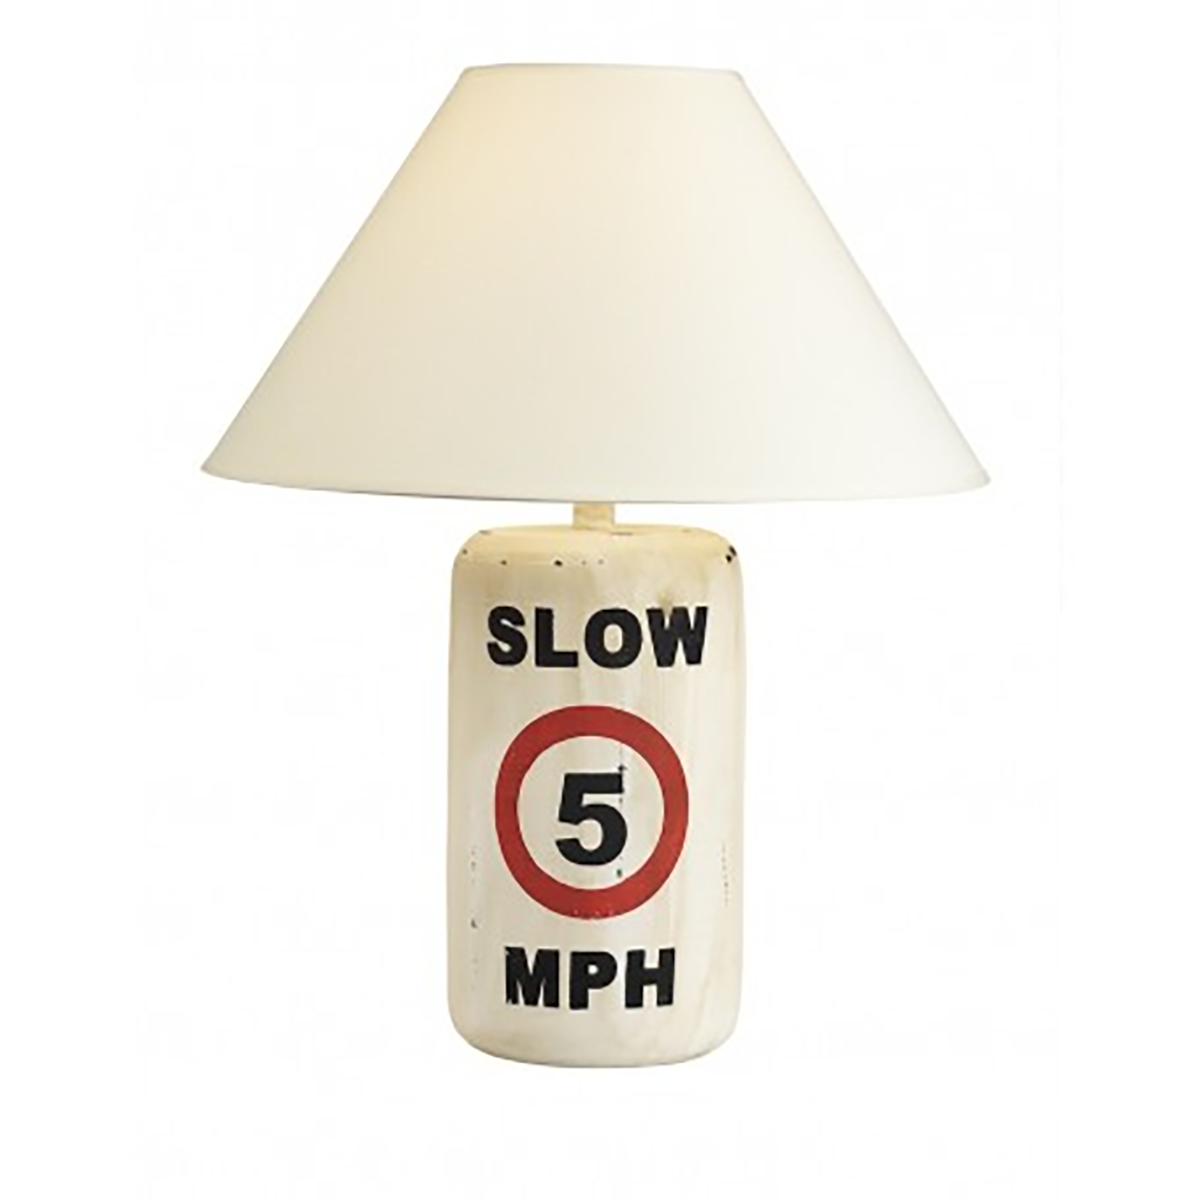 Bója éjjeli lámpa Slow 5 MPH Bója